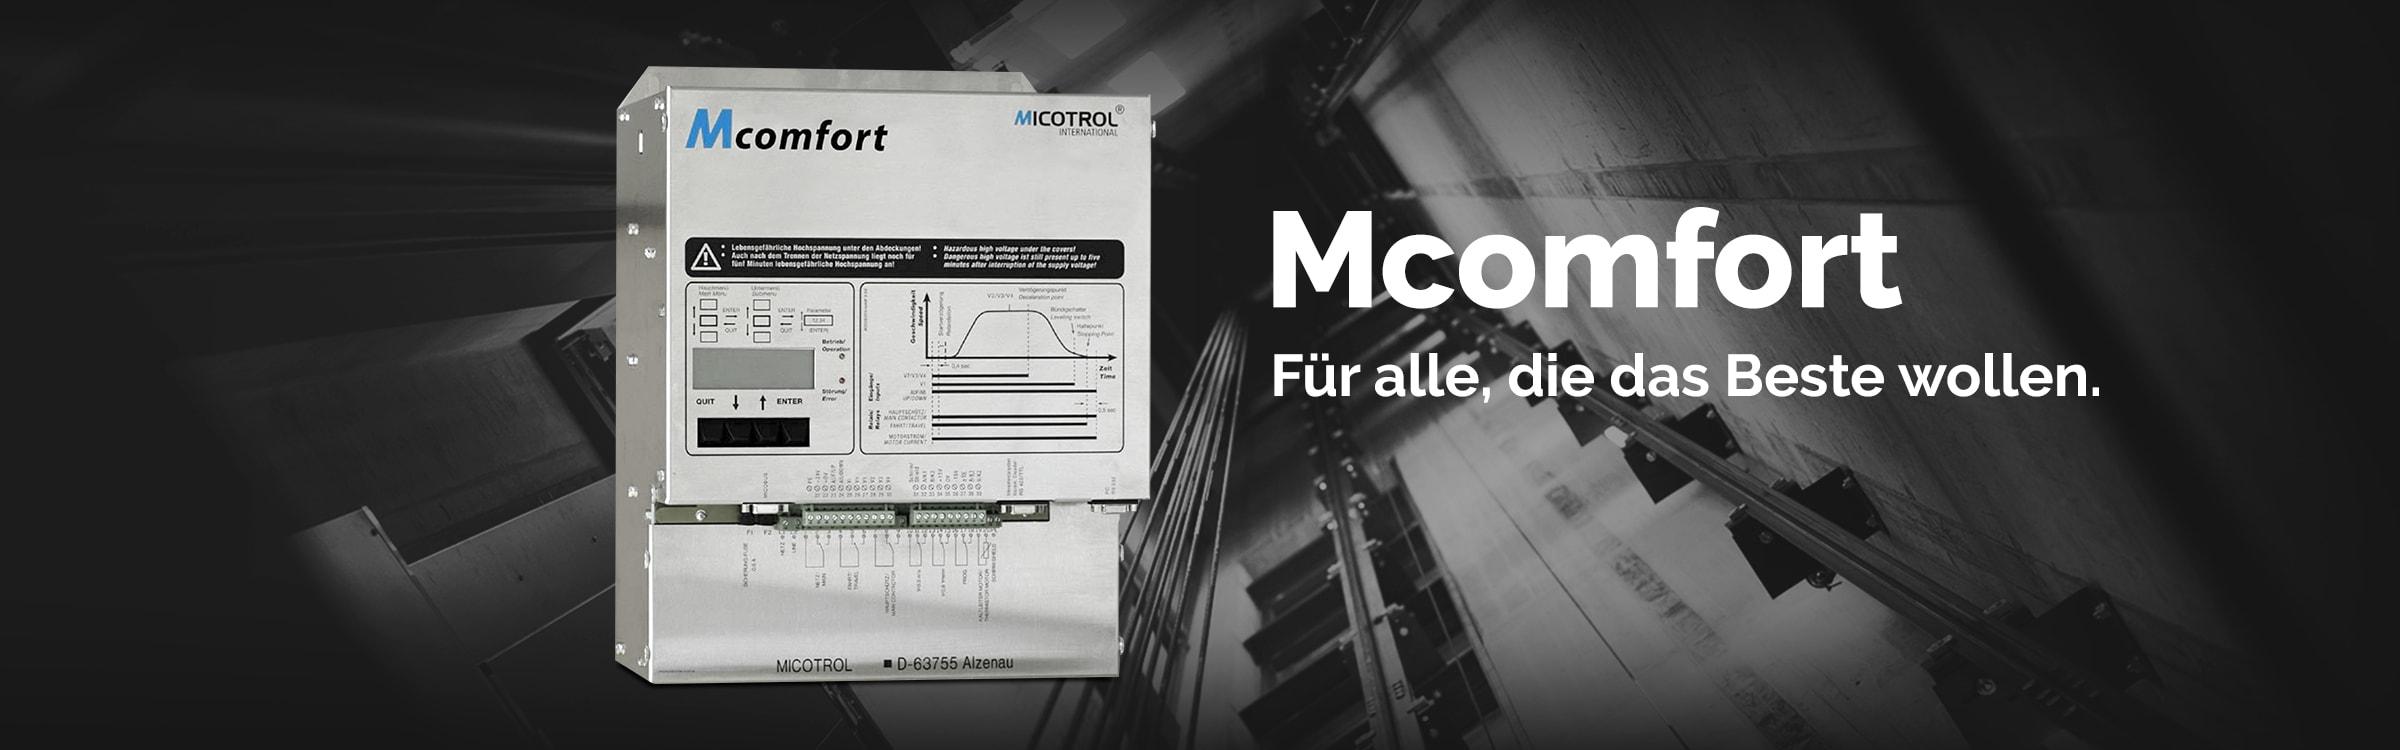 MICOTROL International GmbH